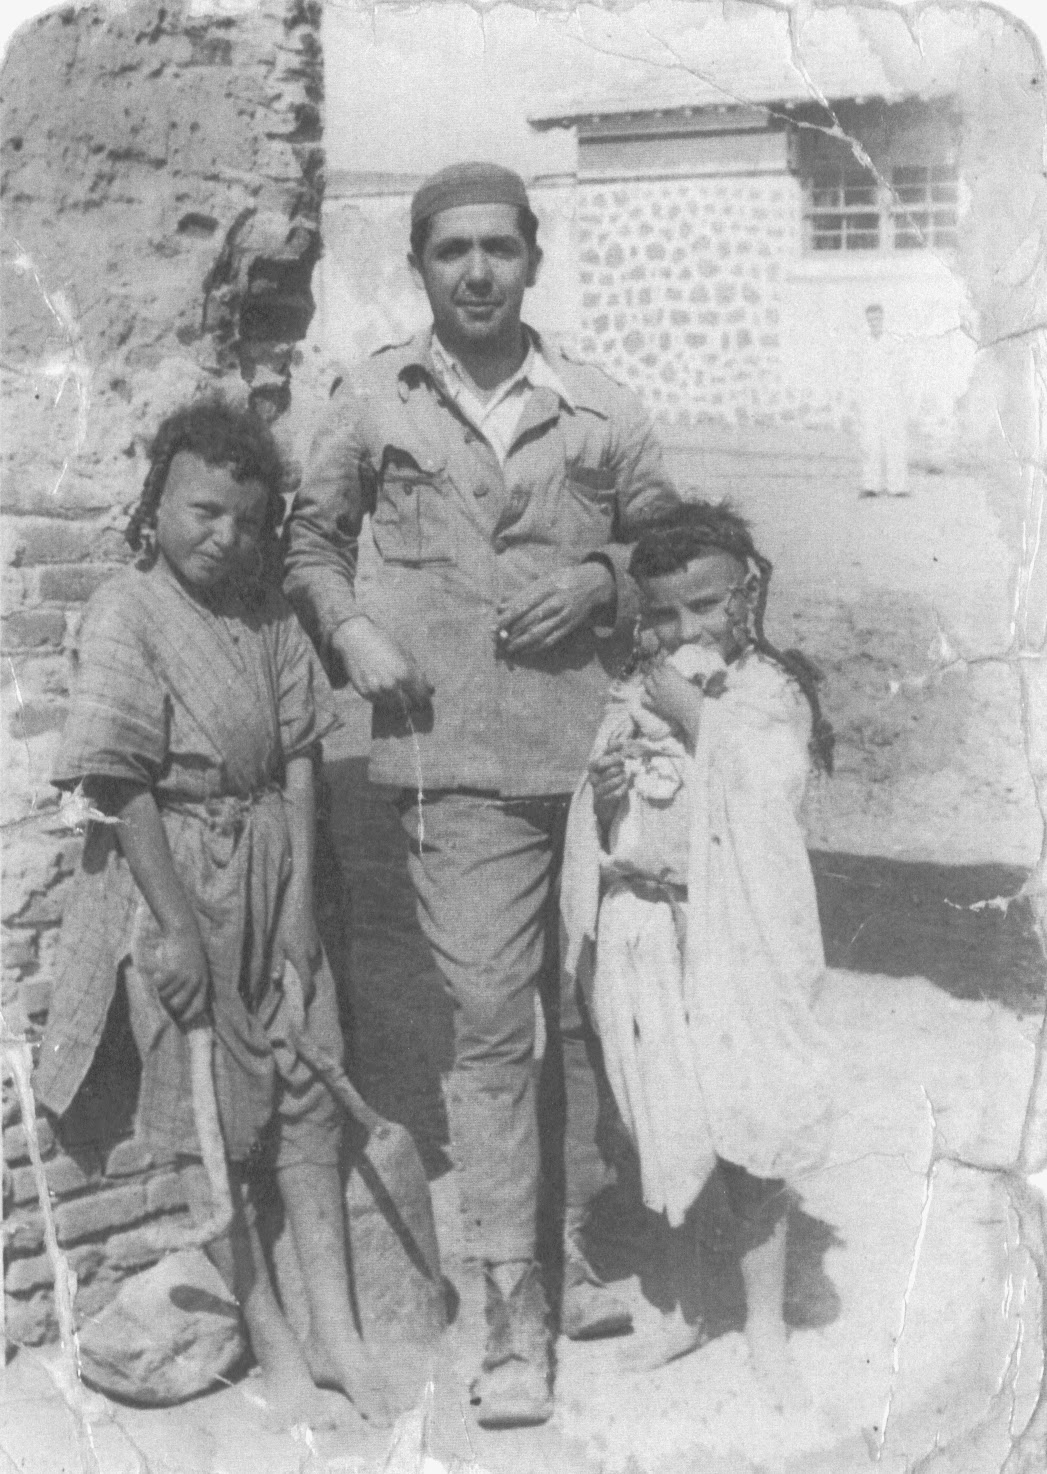 Albun de fotos del la Mili en el Sahara 67